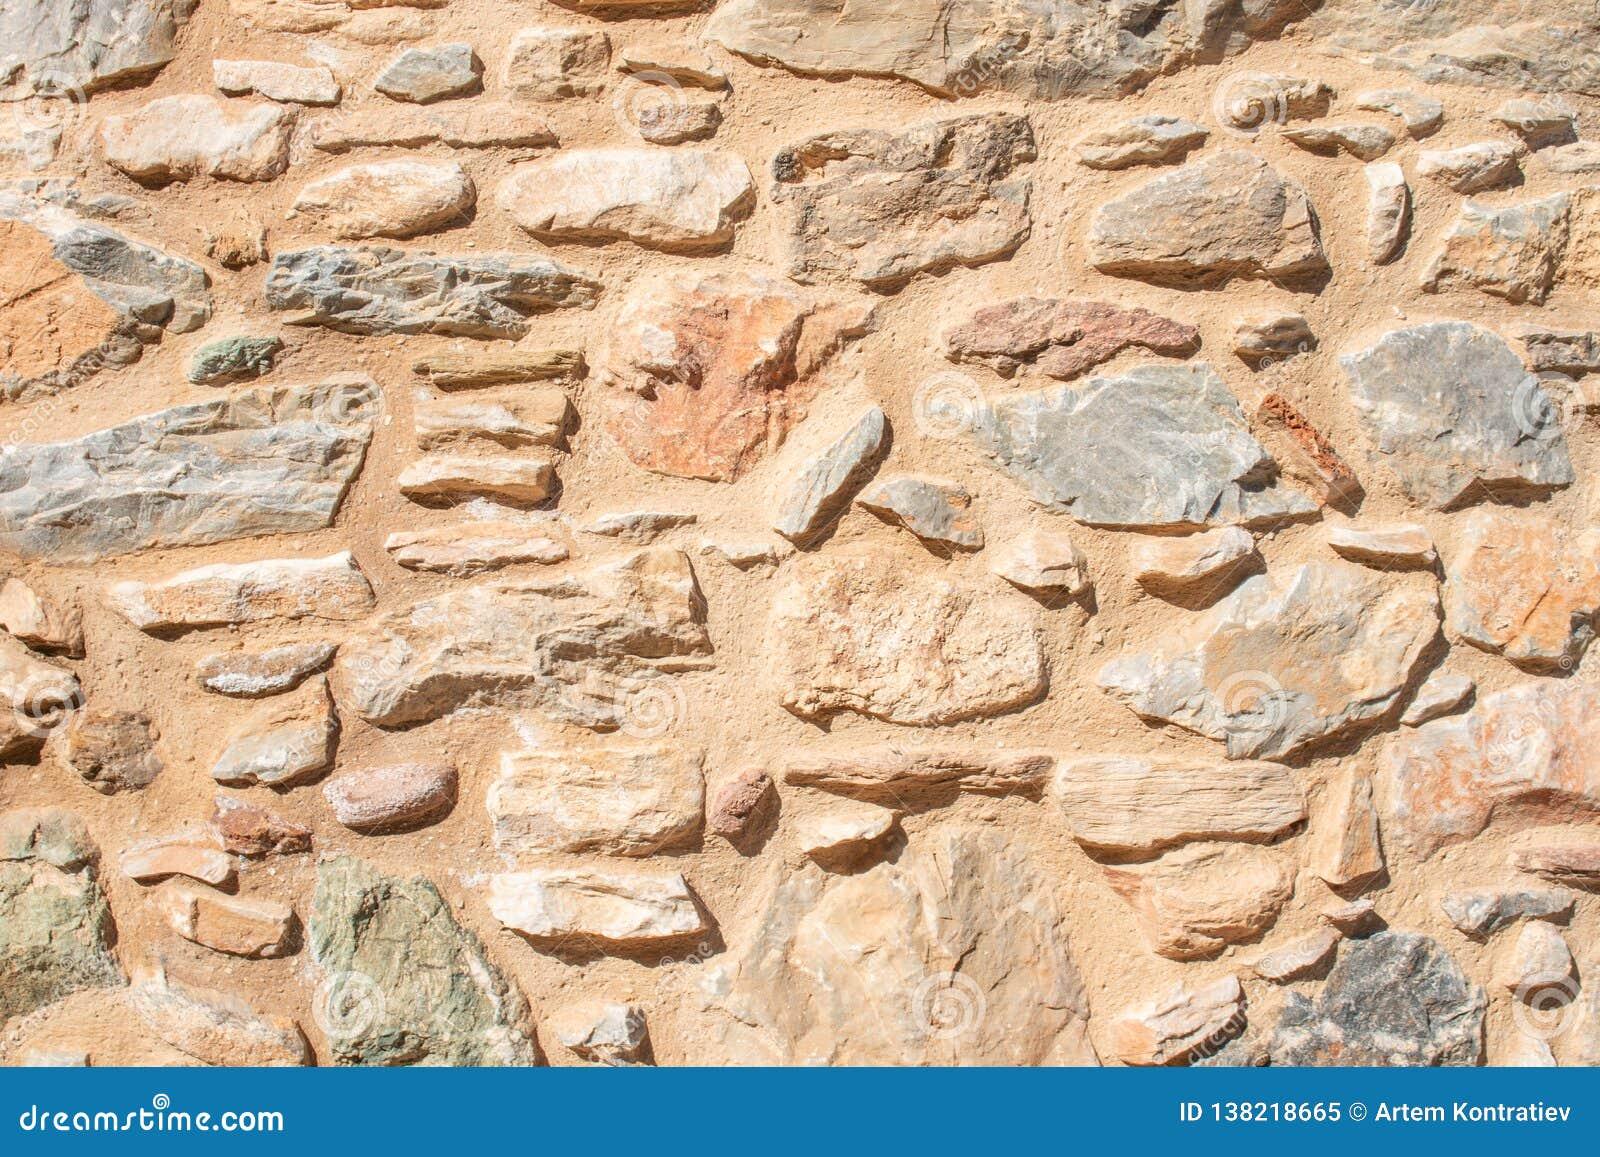 Текстура каменной стены Старая предпосылка текстуры каменной стены замка Текстура камня и стены Briks